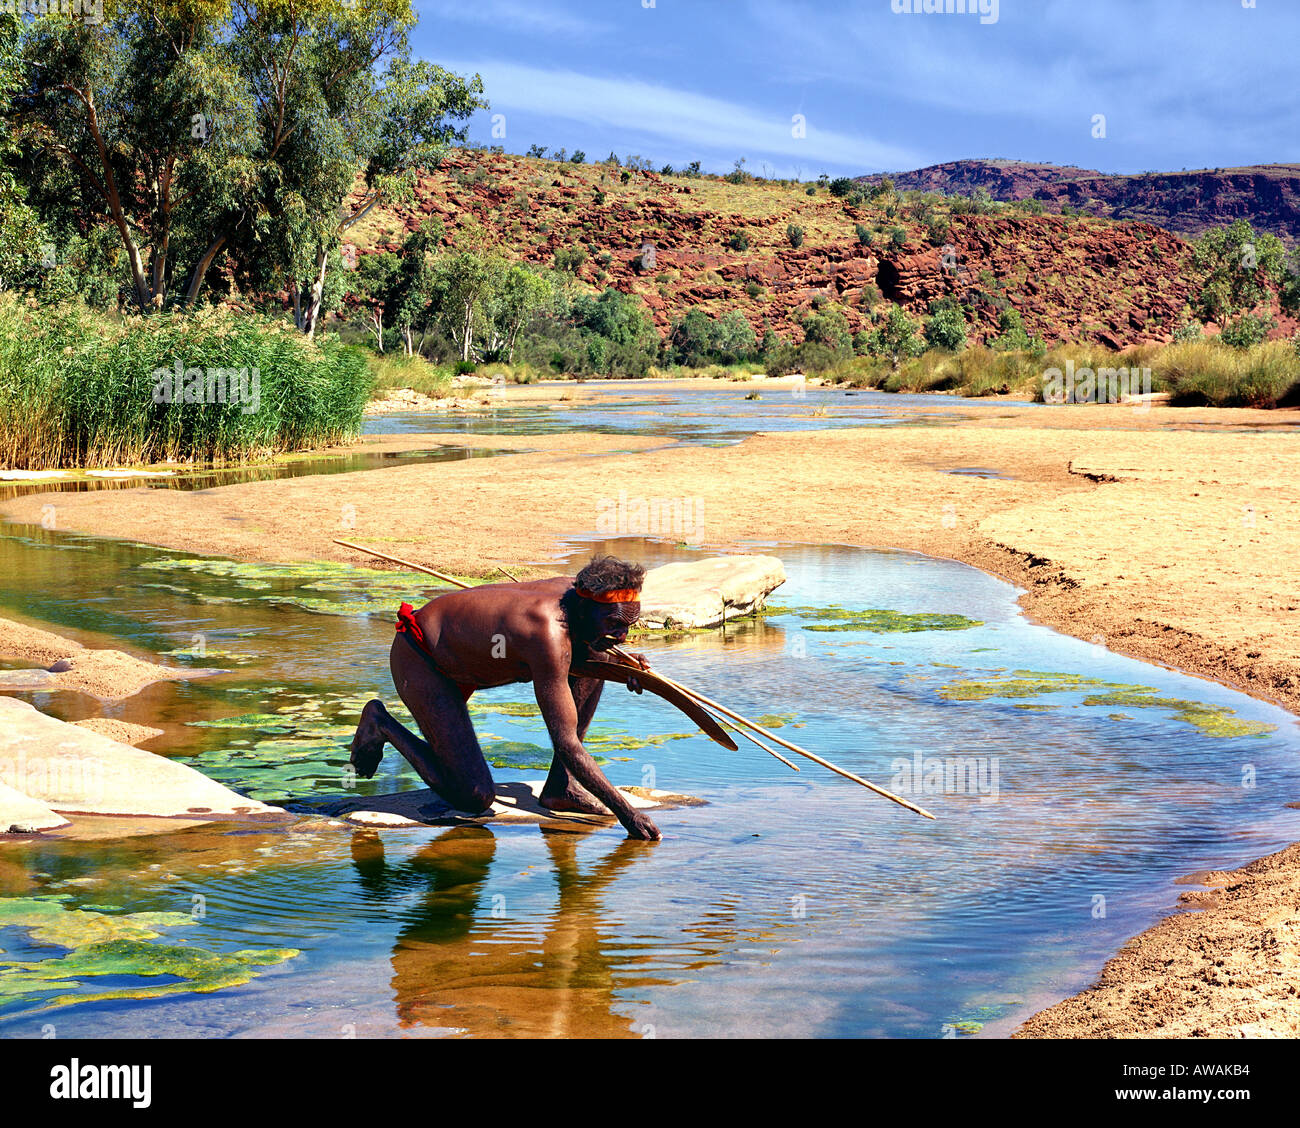 AU - NORTHERN TERRITORY:  Native Aborigine - Stock Image